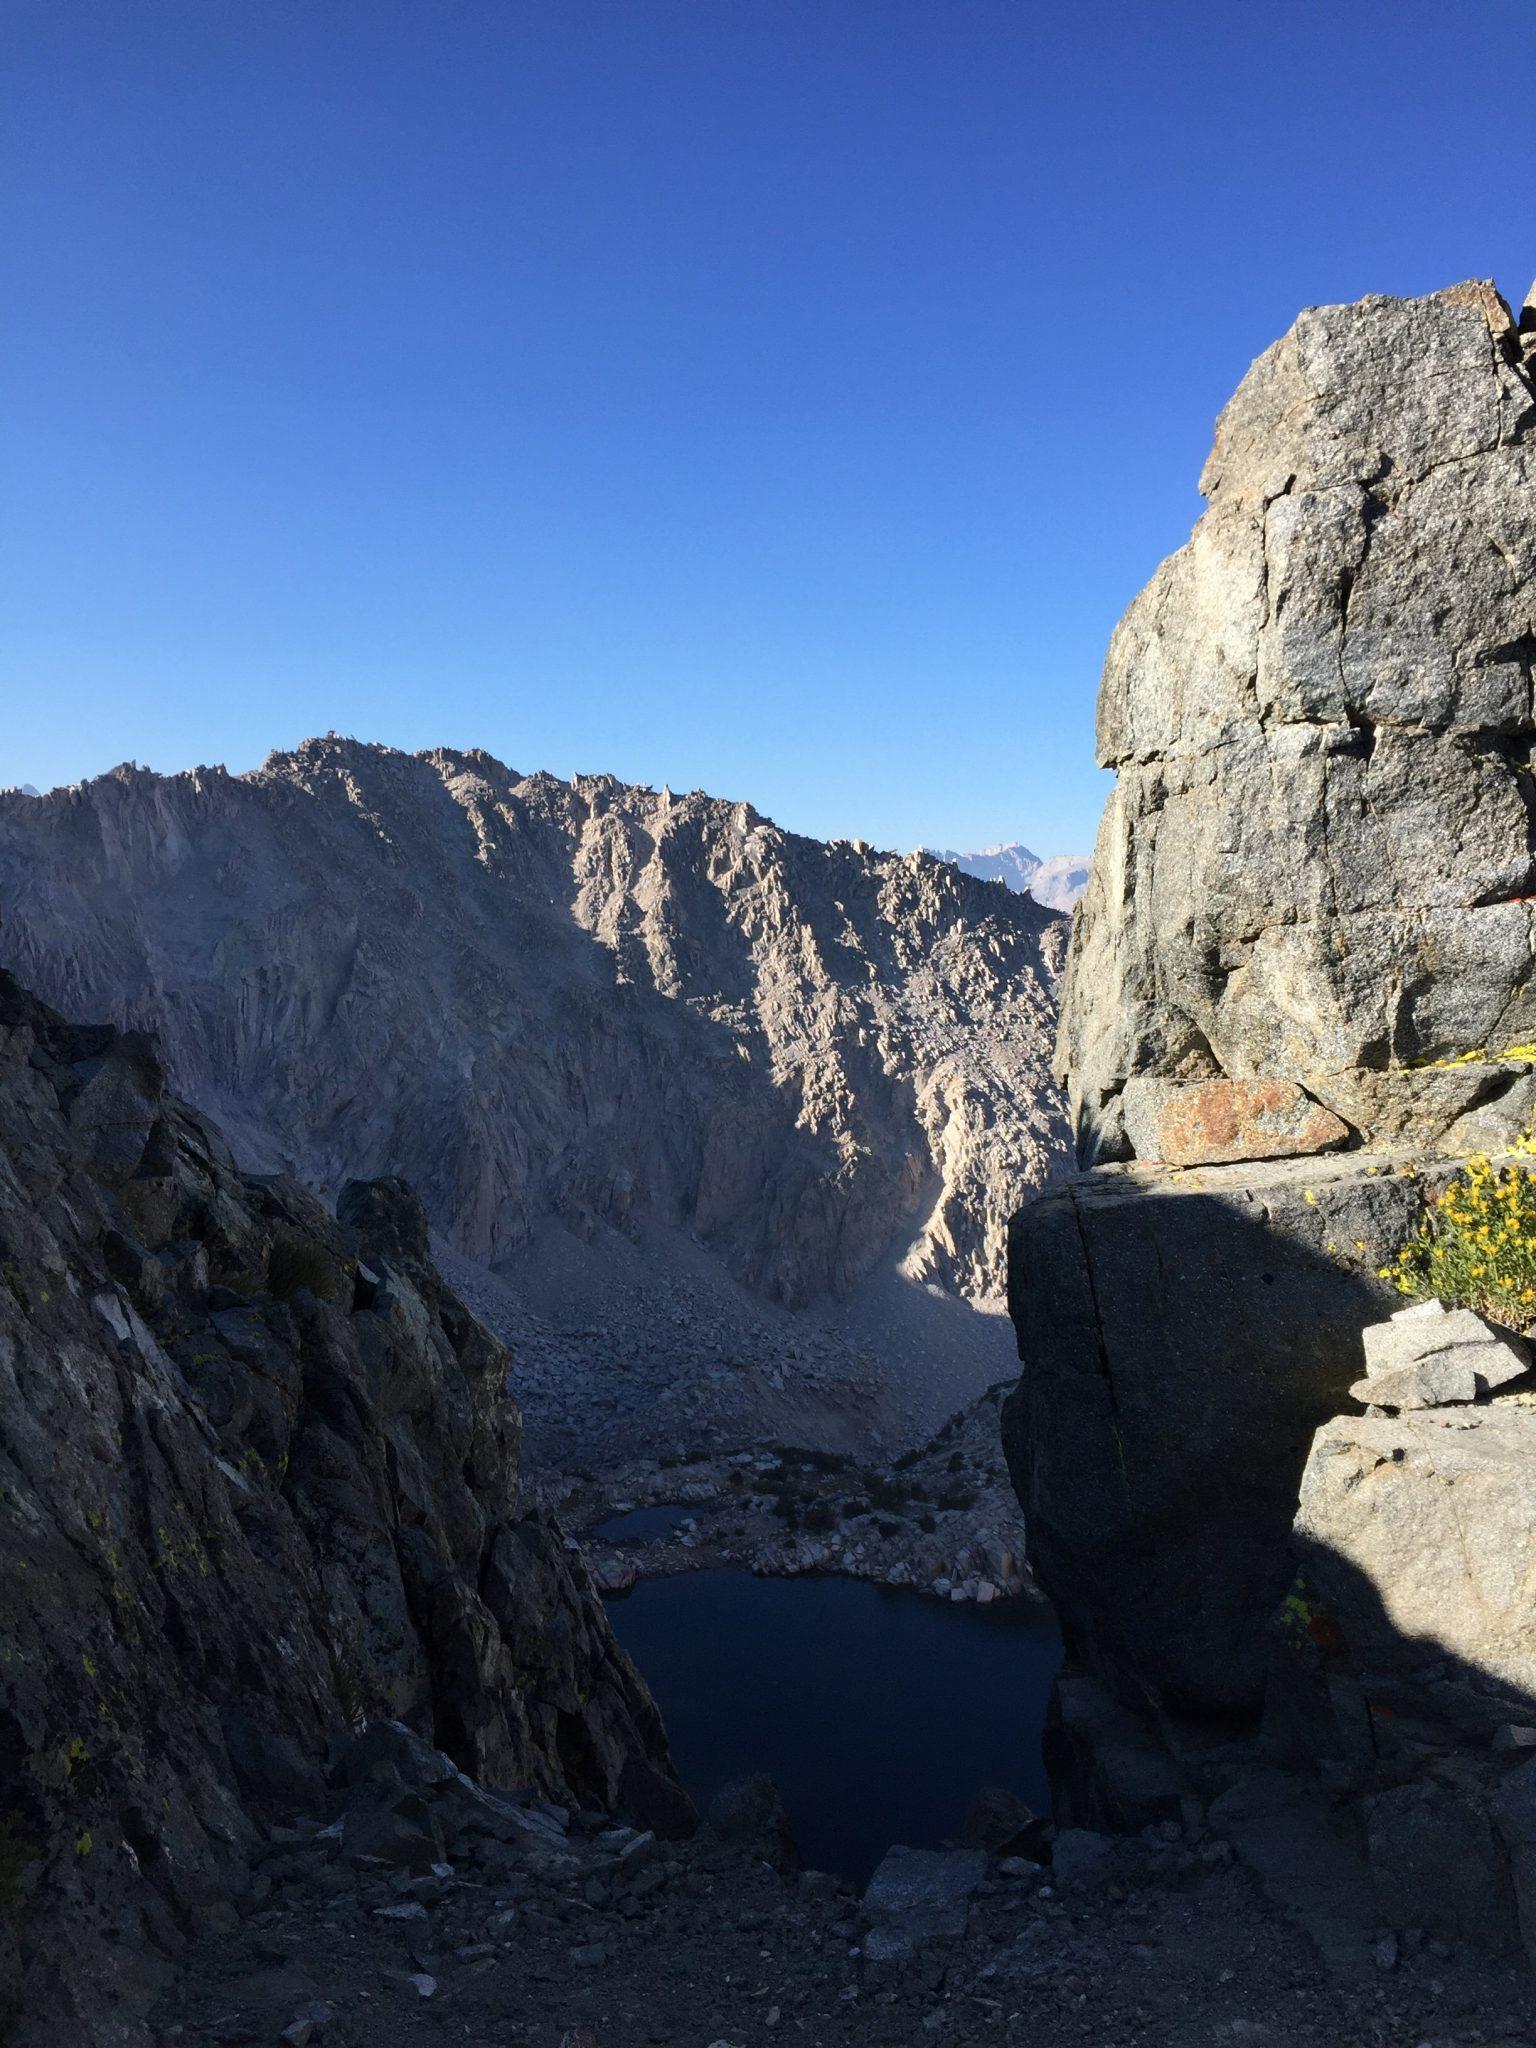 Glen Pass